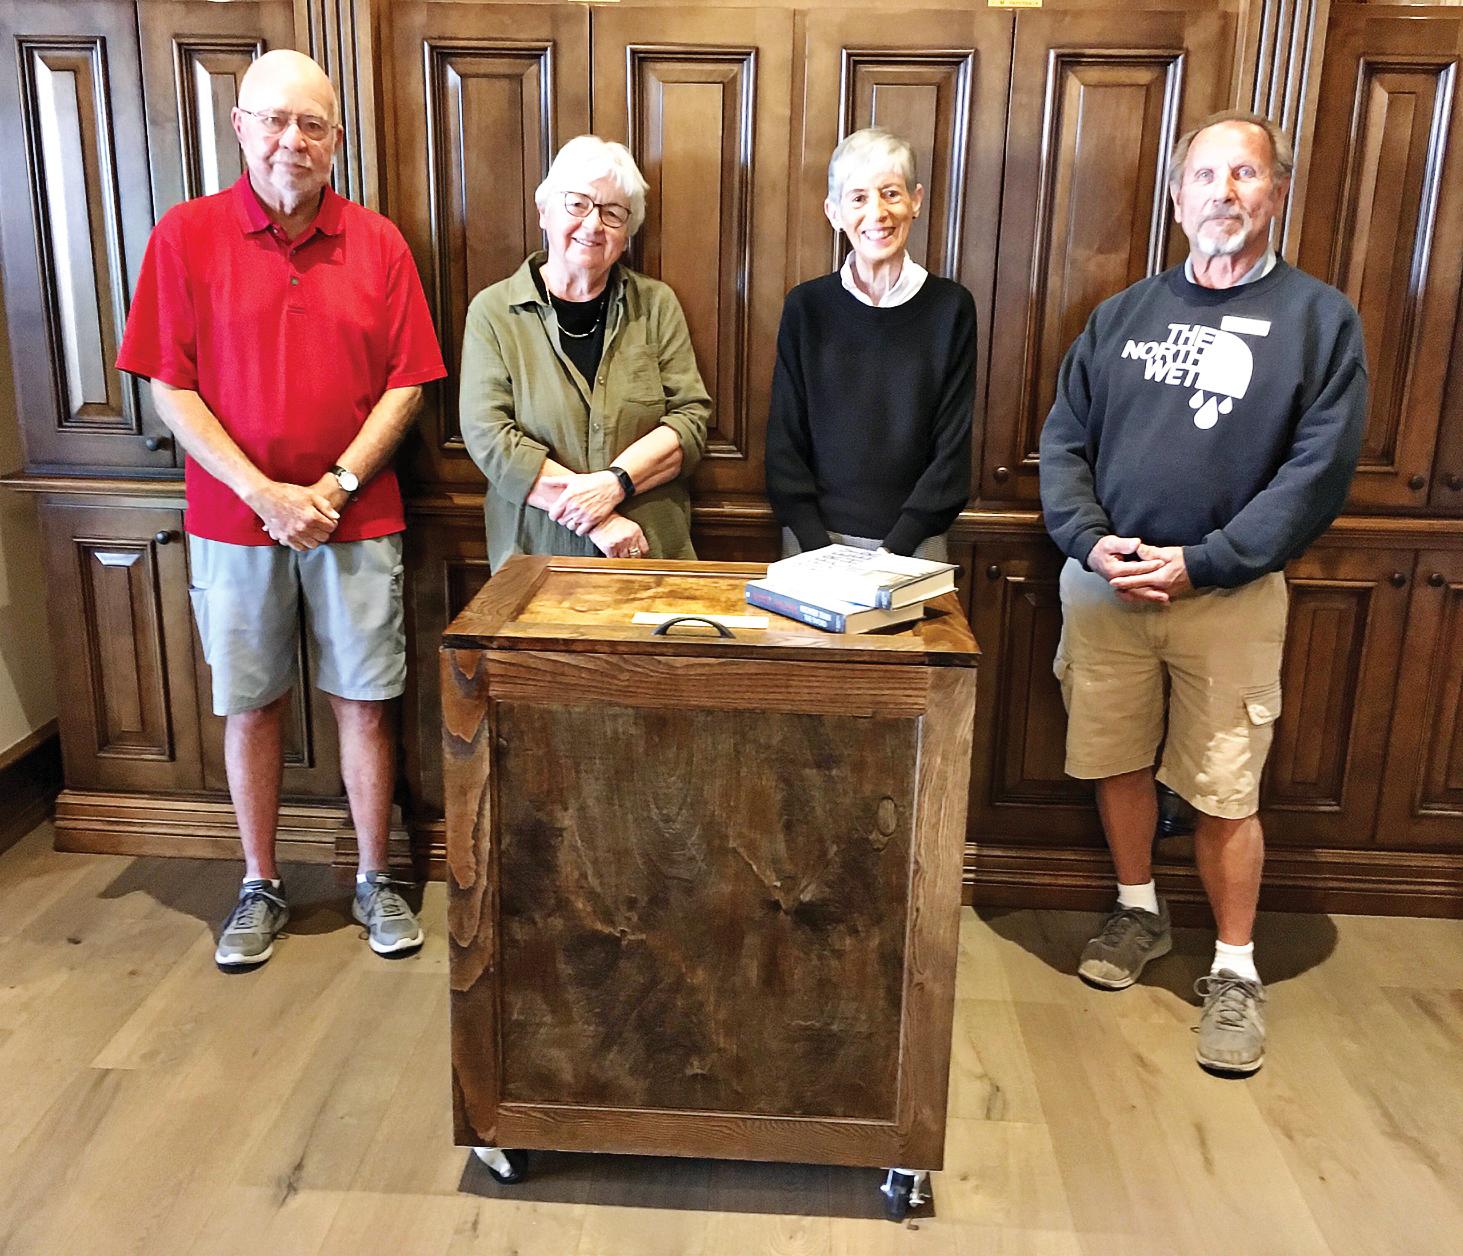 Left to right: Phil Geddes, Joan Stoddart, Susan Warburton, and Gary Nieberger